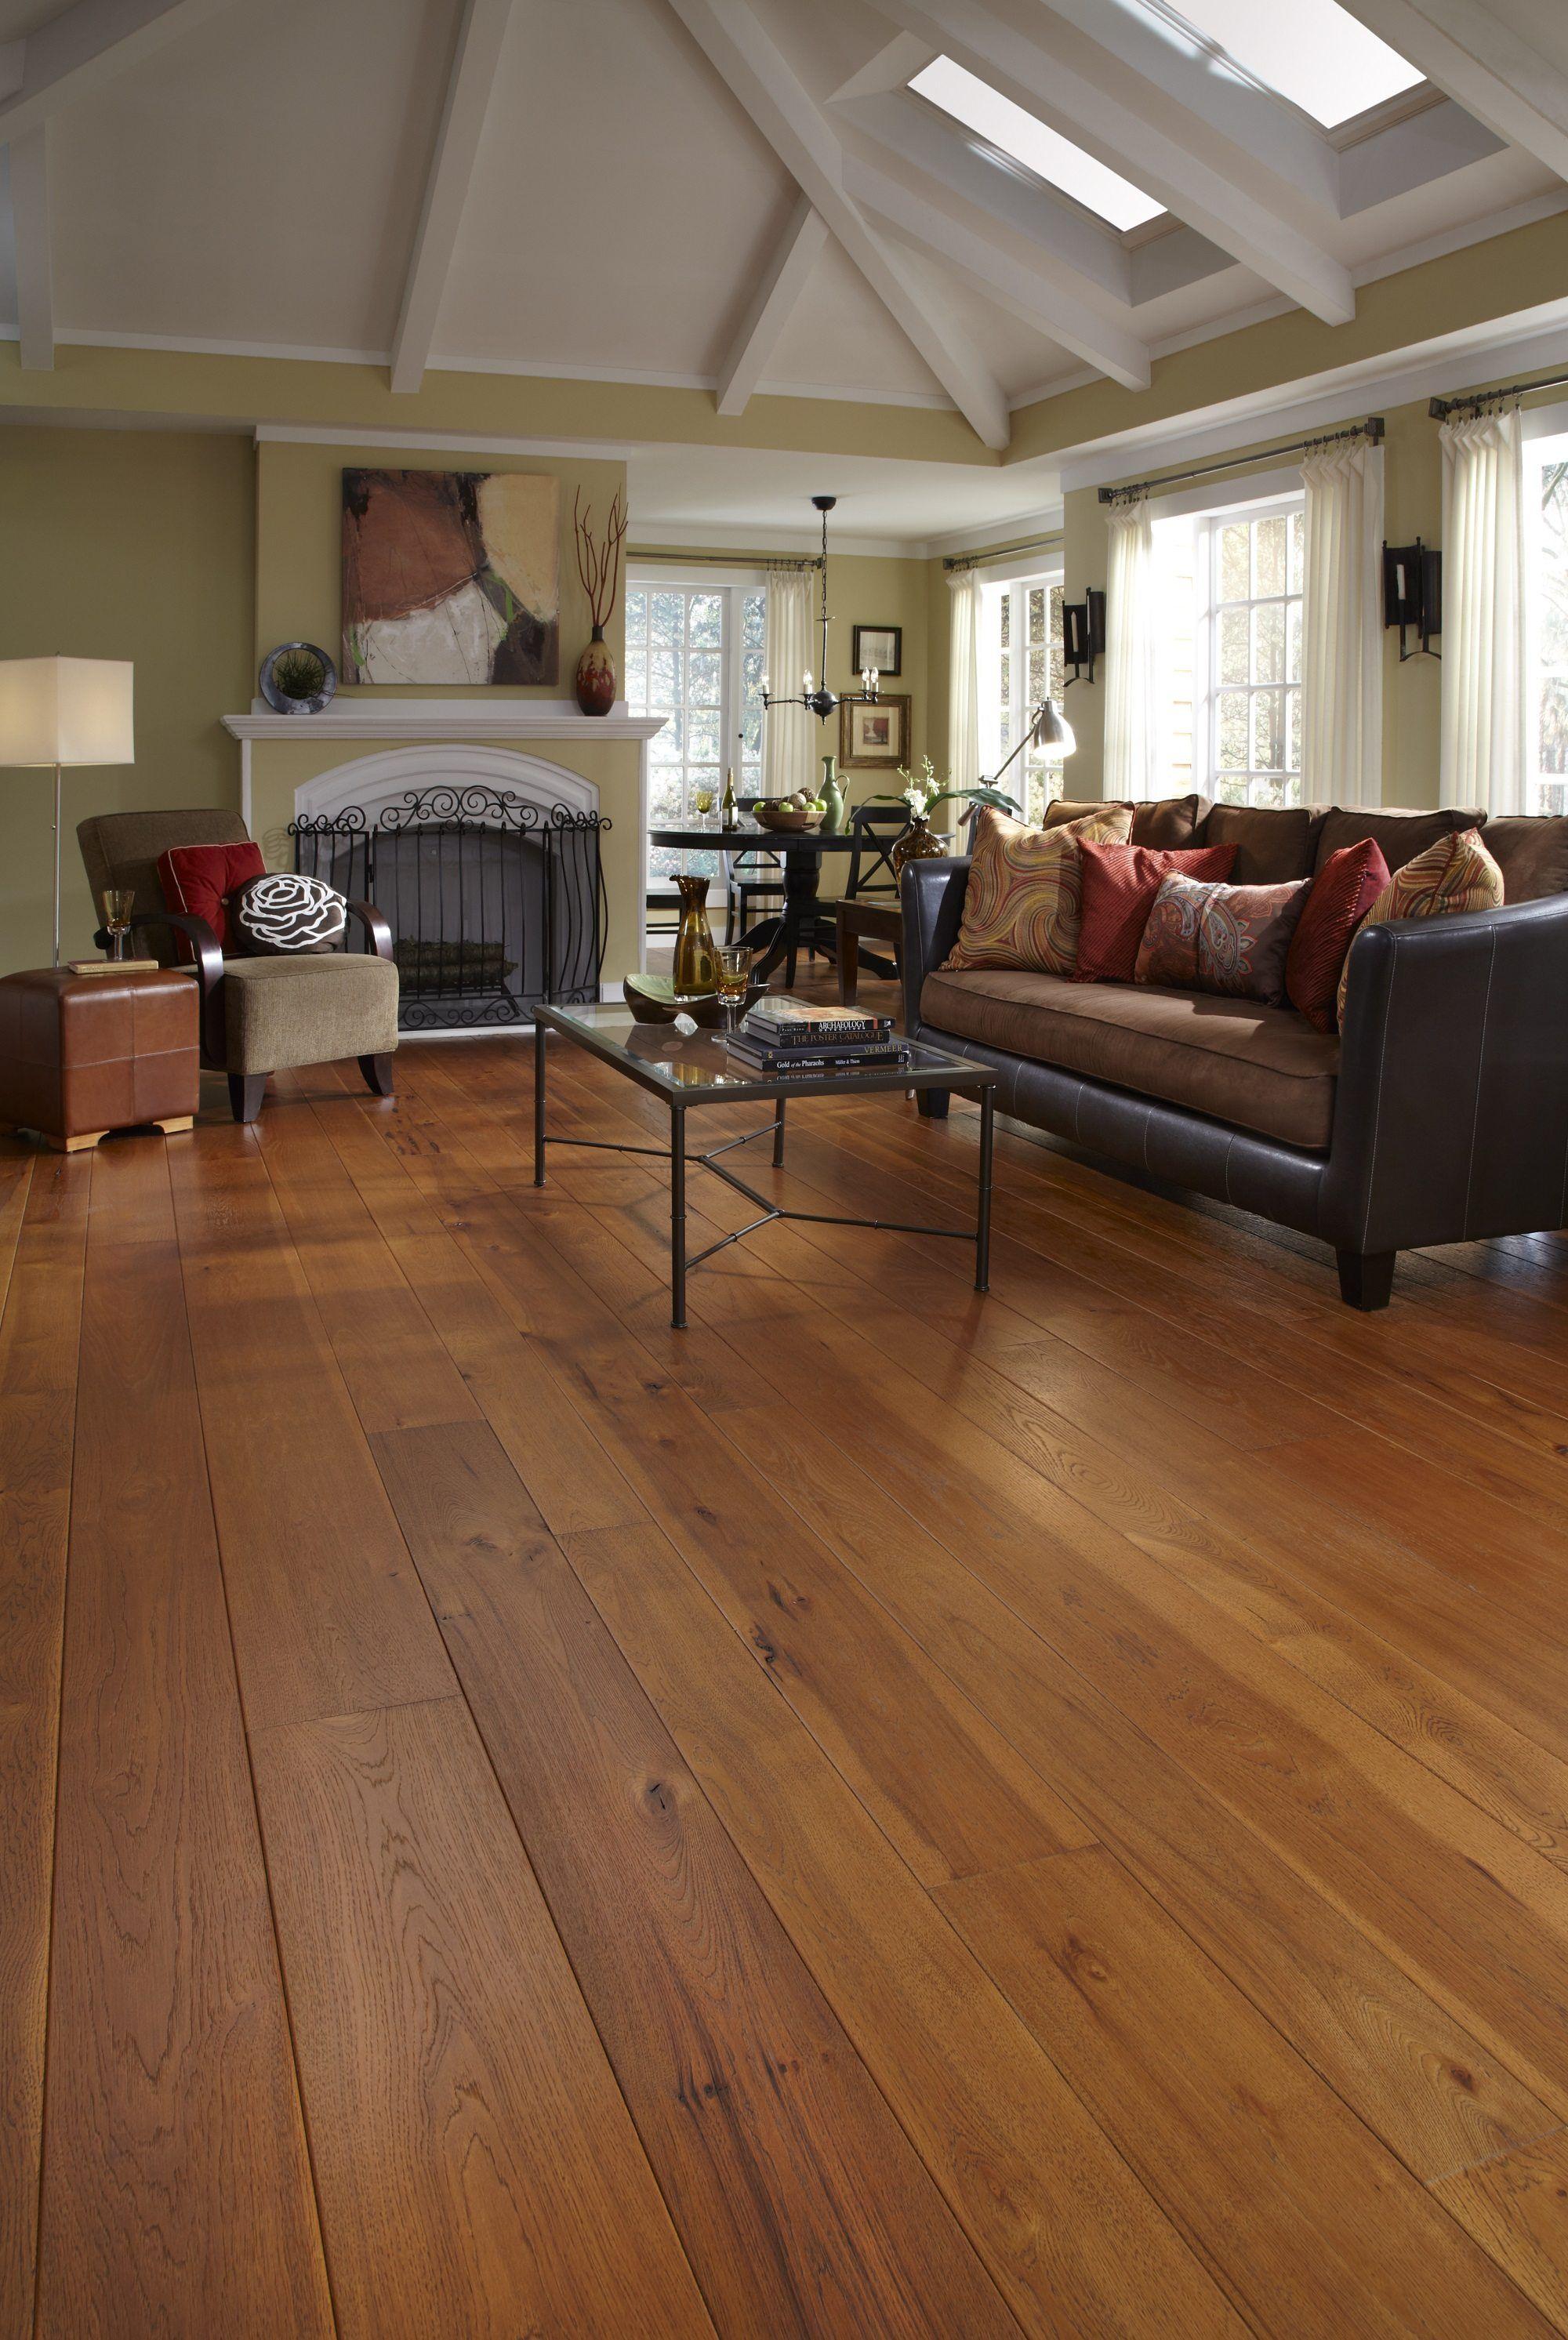 Hickory Hardwood Flooring In Living Room In 2019 Floors